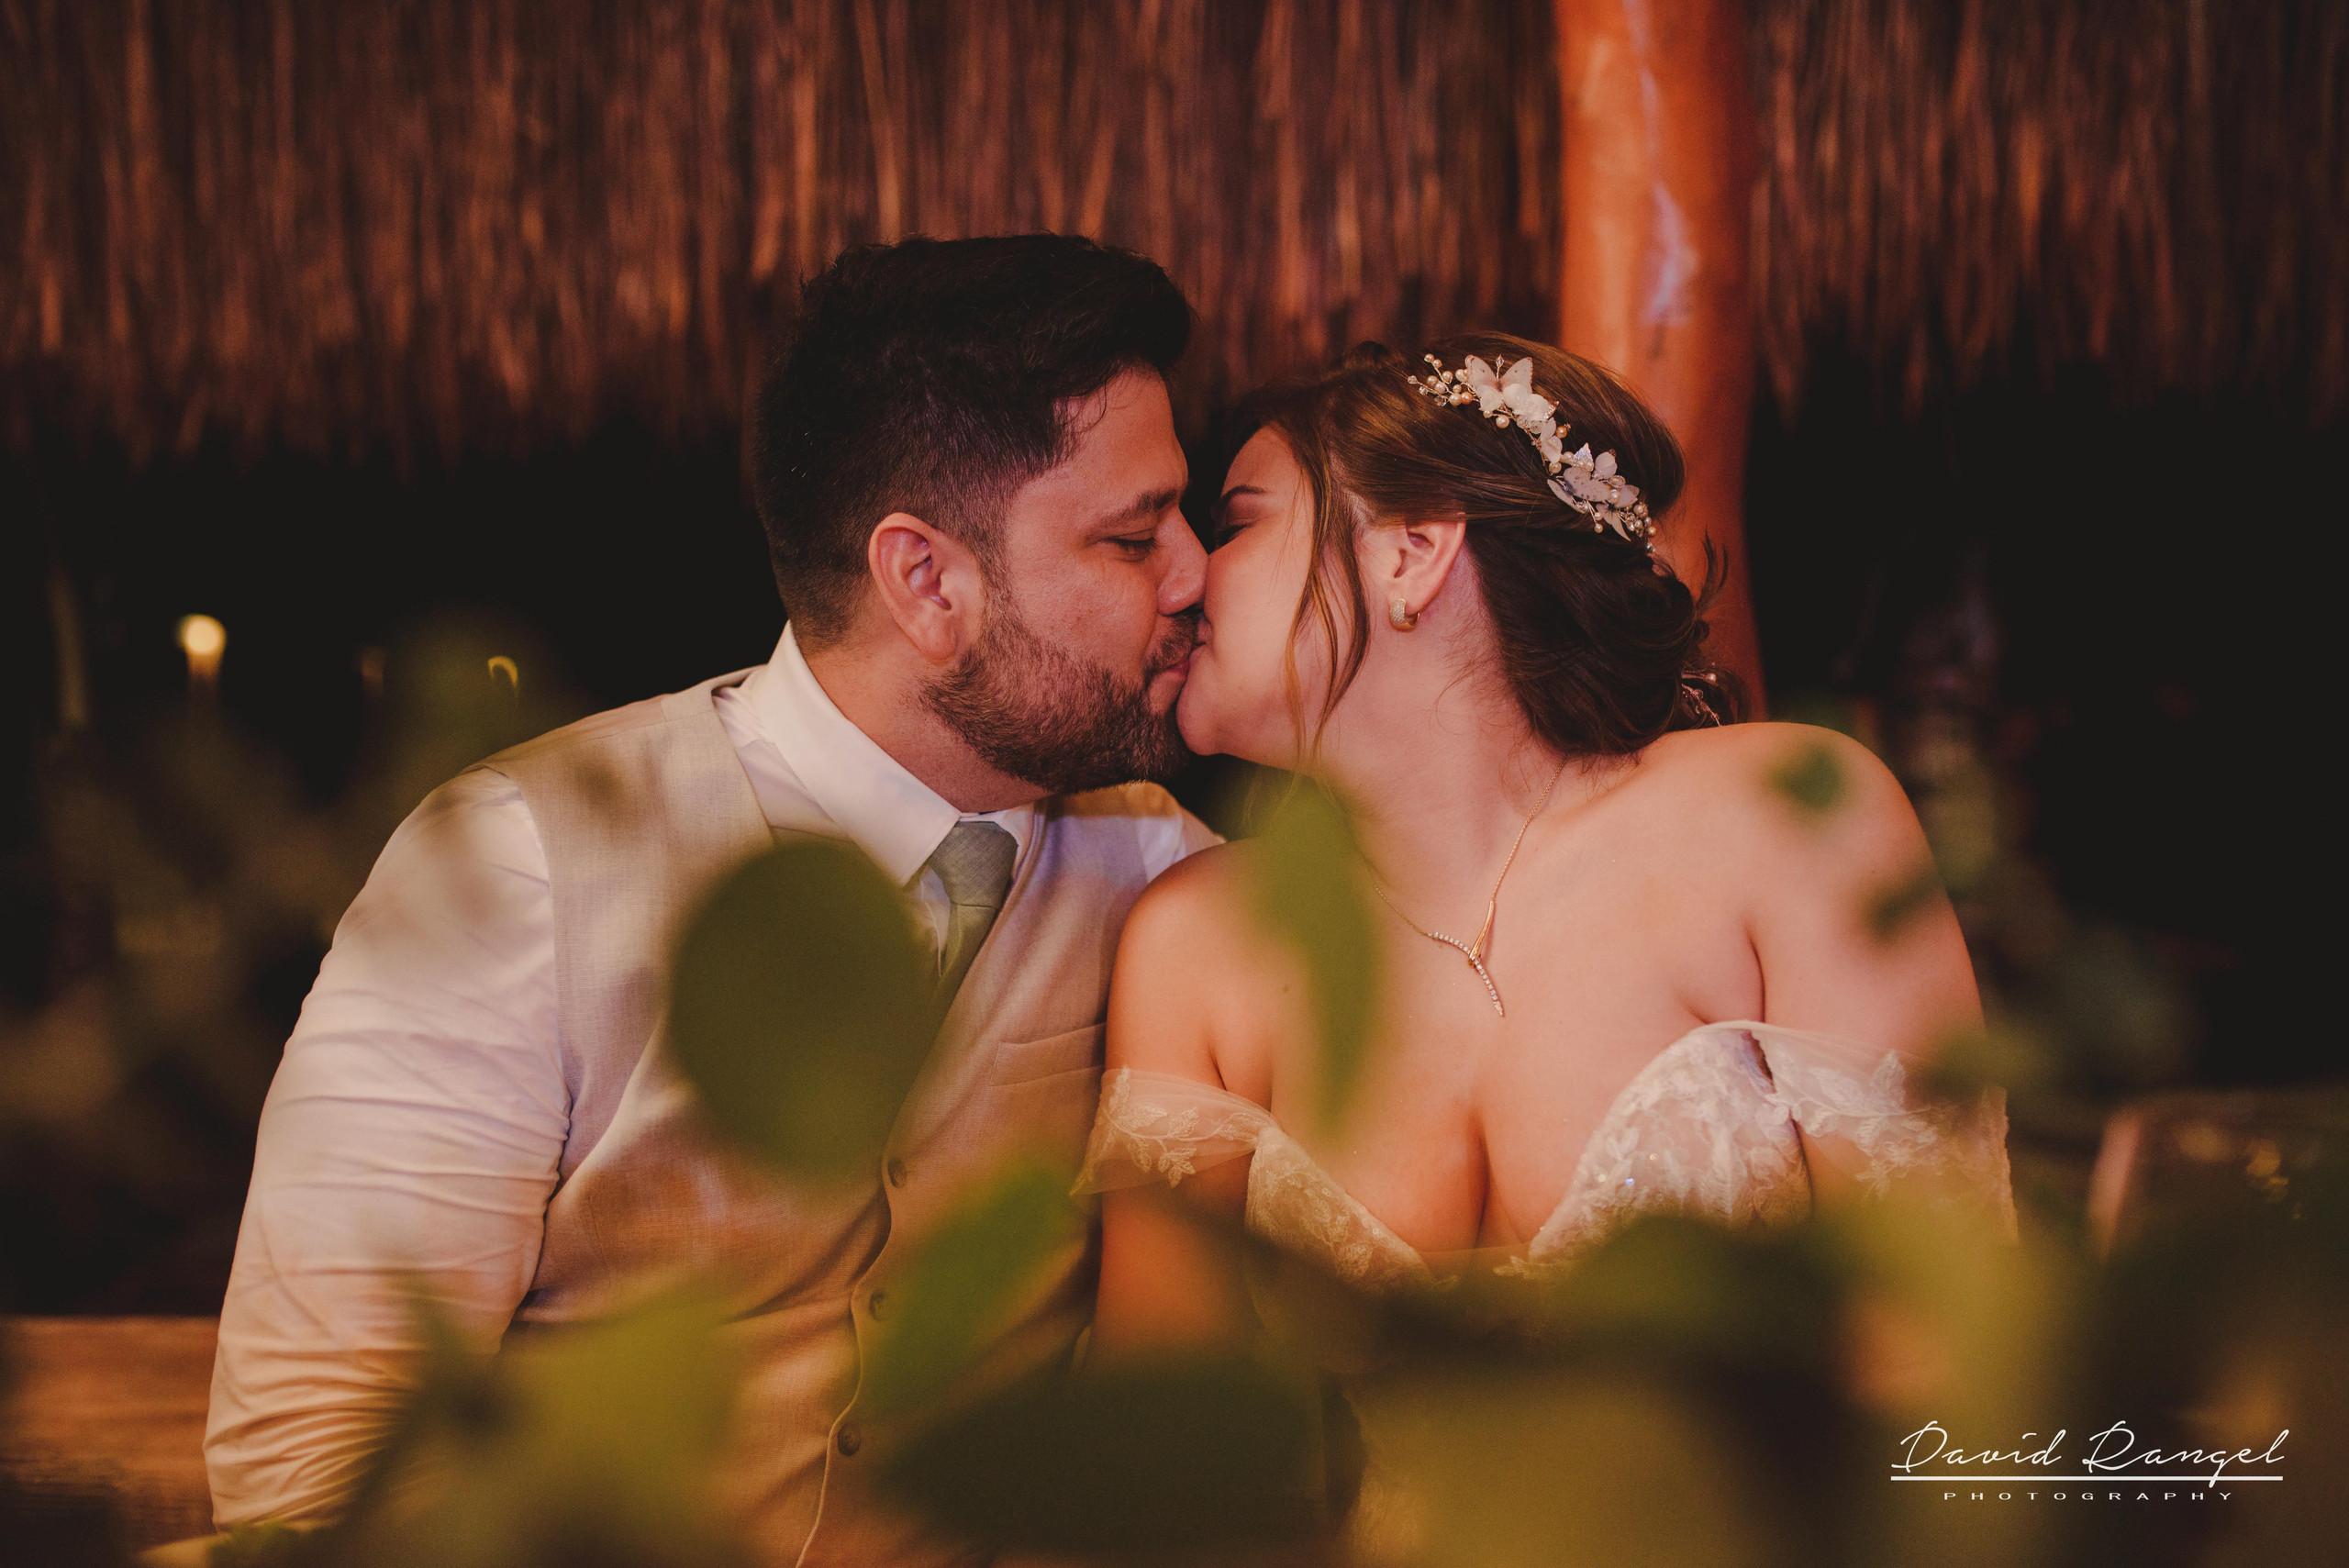 bride+groom+beach+session+happy+love+couple+celebration+wedding+photo+beach+caribean+sea+photographer+david+rangel+dress+suit+villa+chenera+main+entrance+reception+kiss